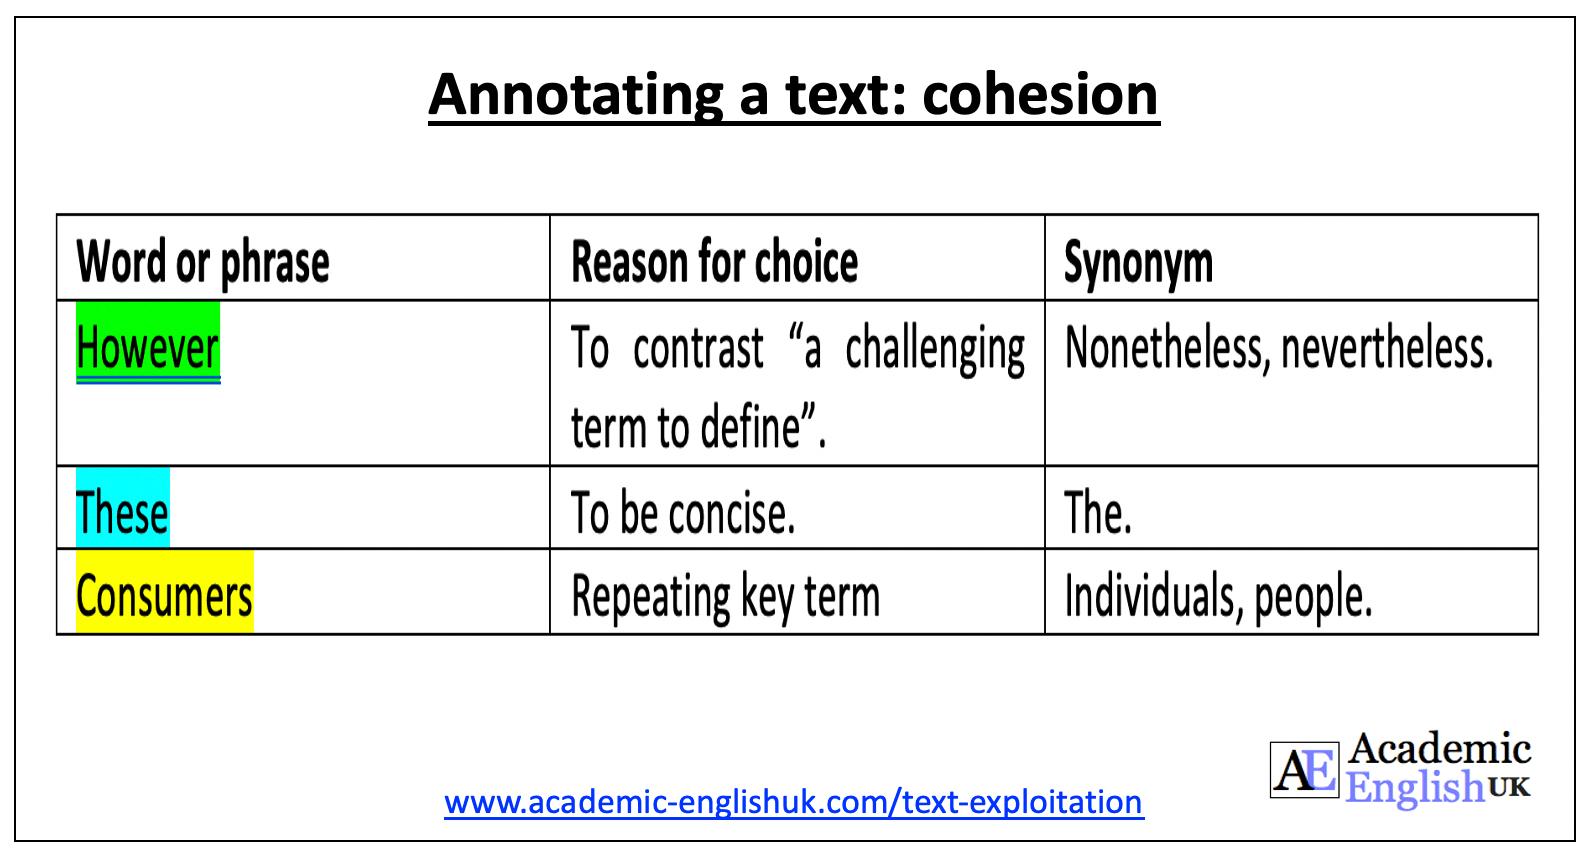 cohesion table academic English uk